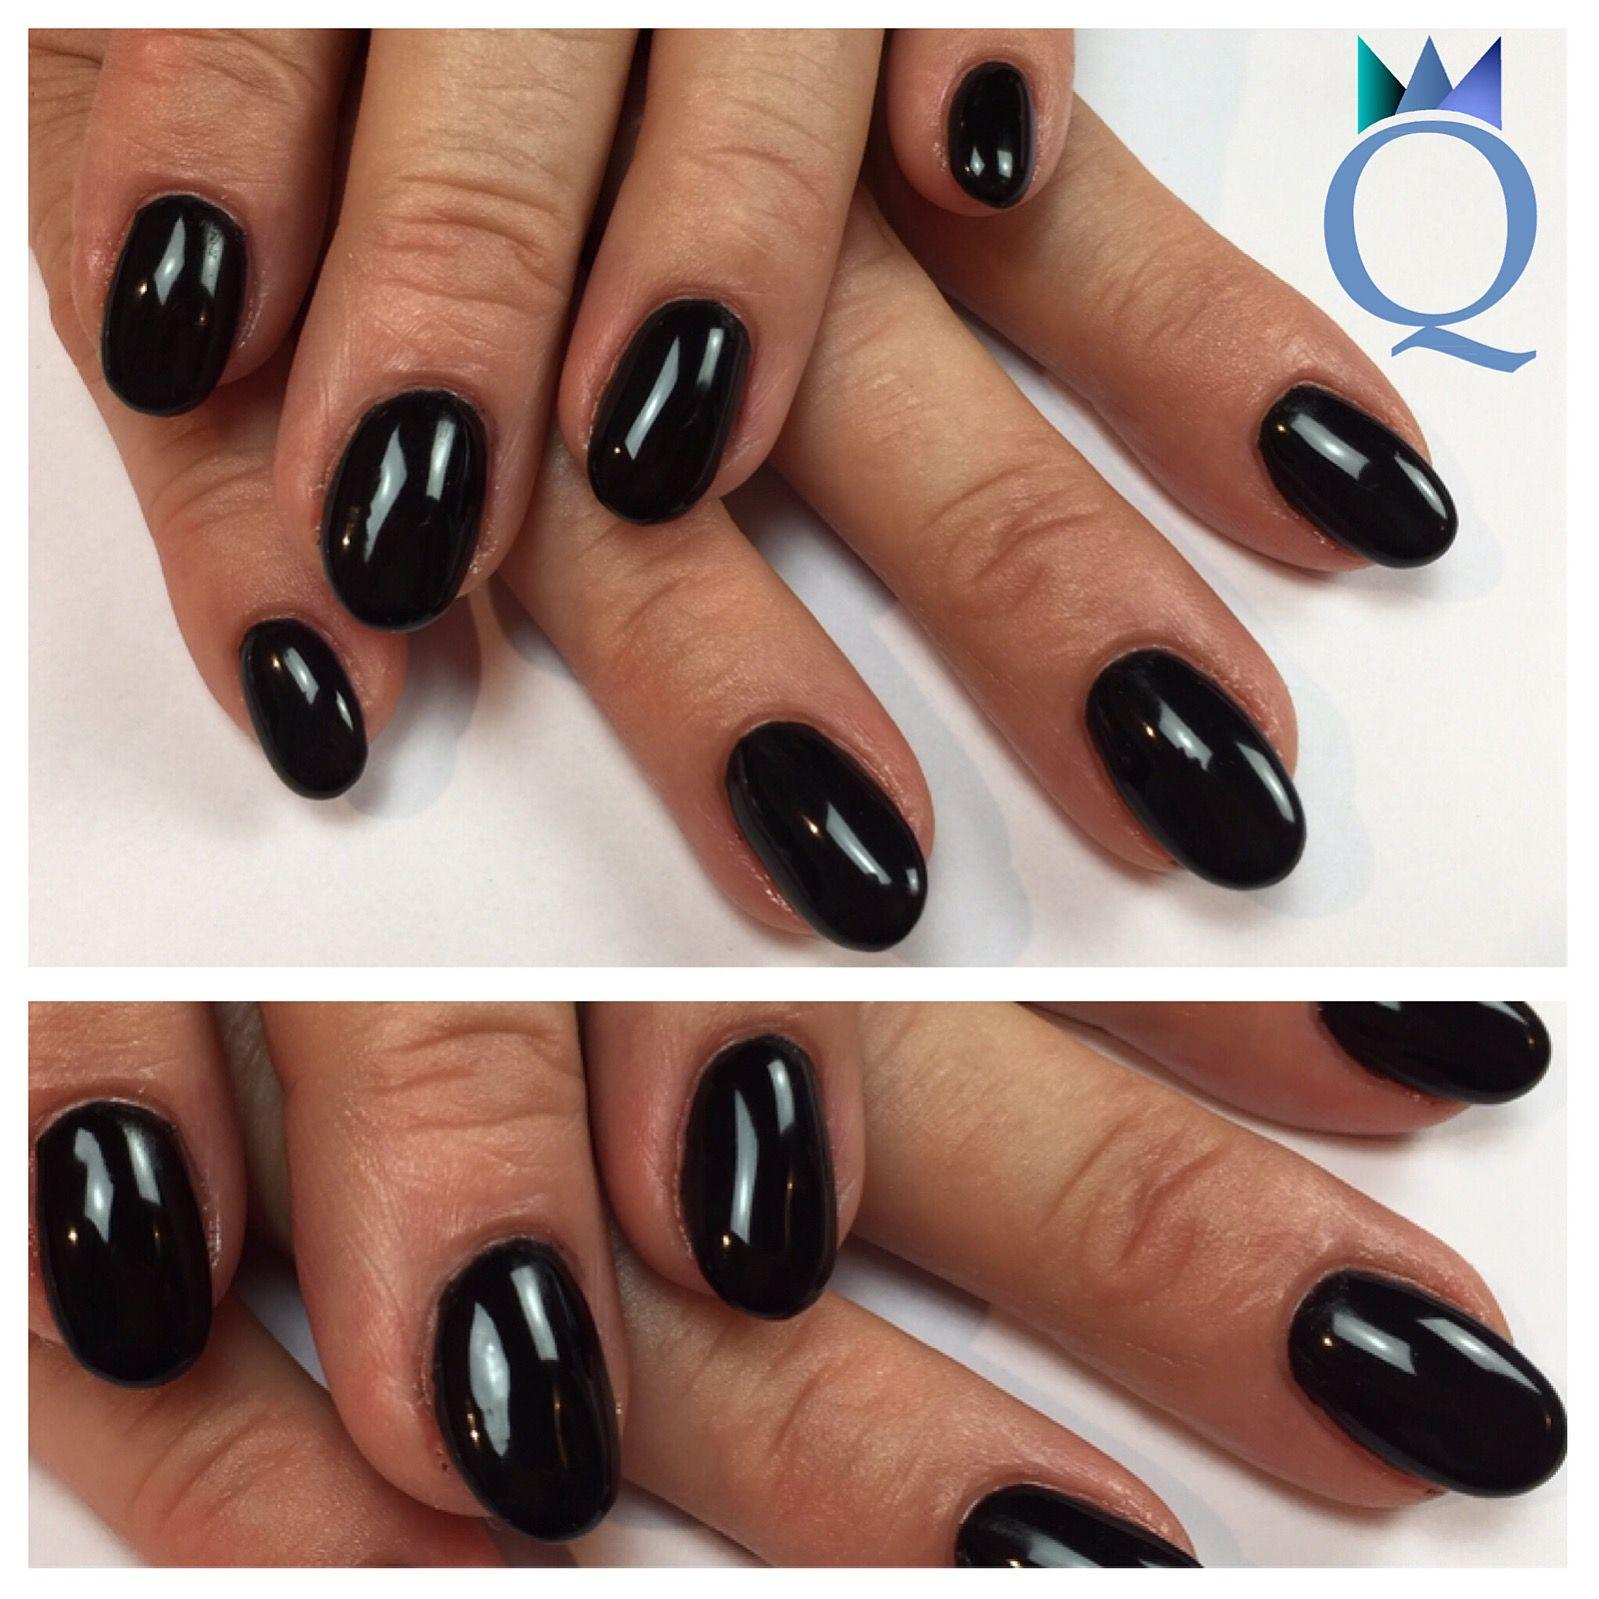 roundnails #gelnails #nails #black #rundenägel #gelnägel #nägel ...